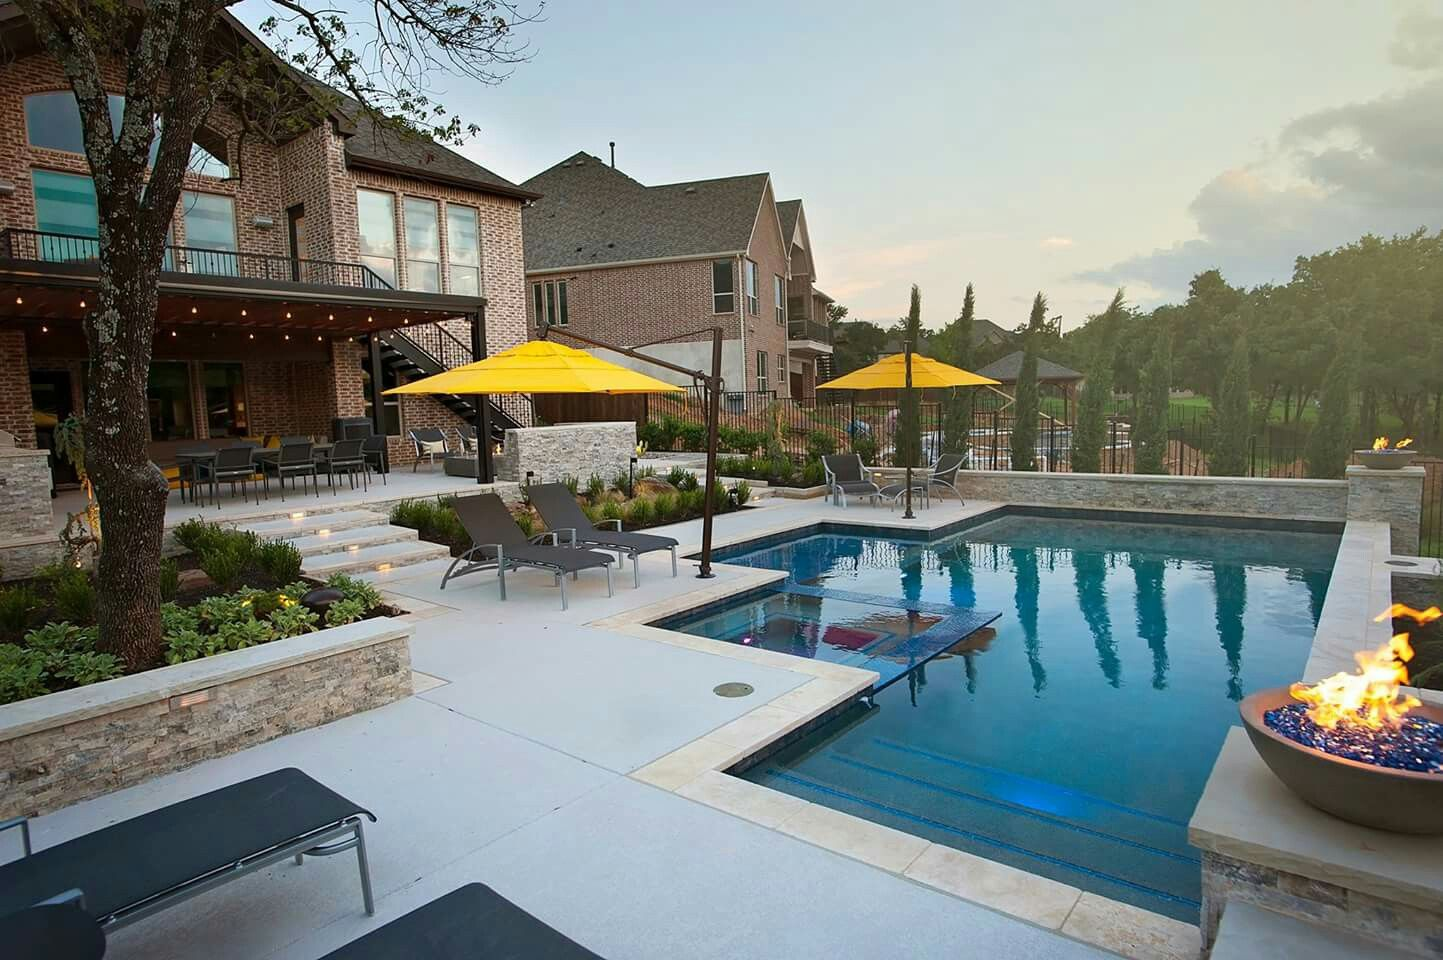 Complete Outdoor Living - Modern Pool - Outdoor Lighting ... on Complete Outdoor Living id=22318